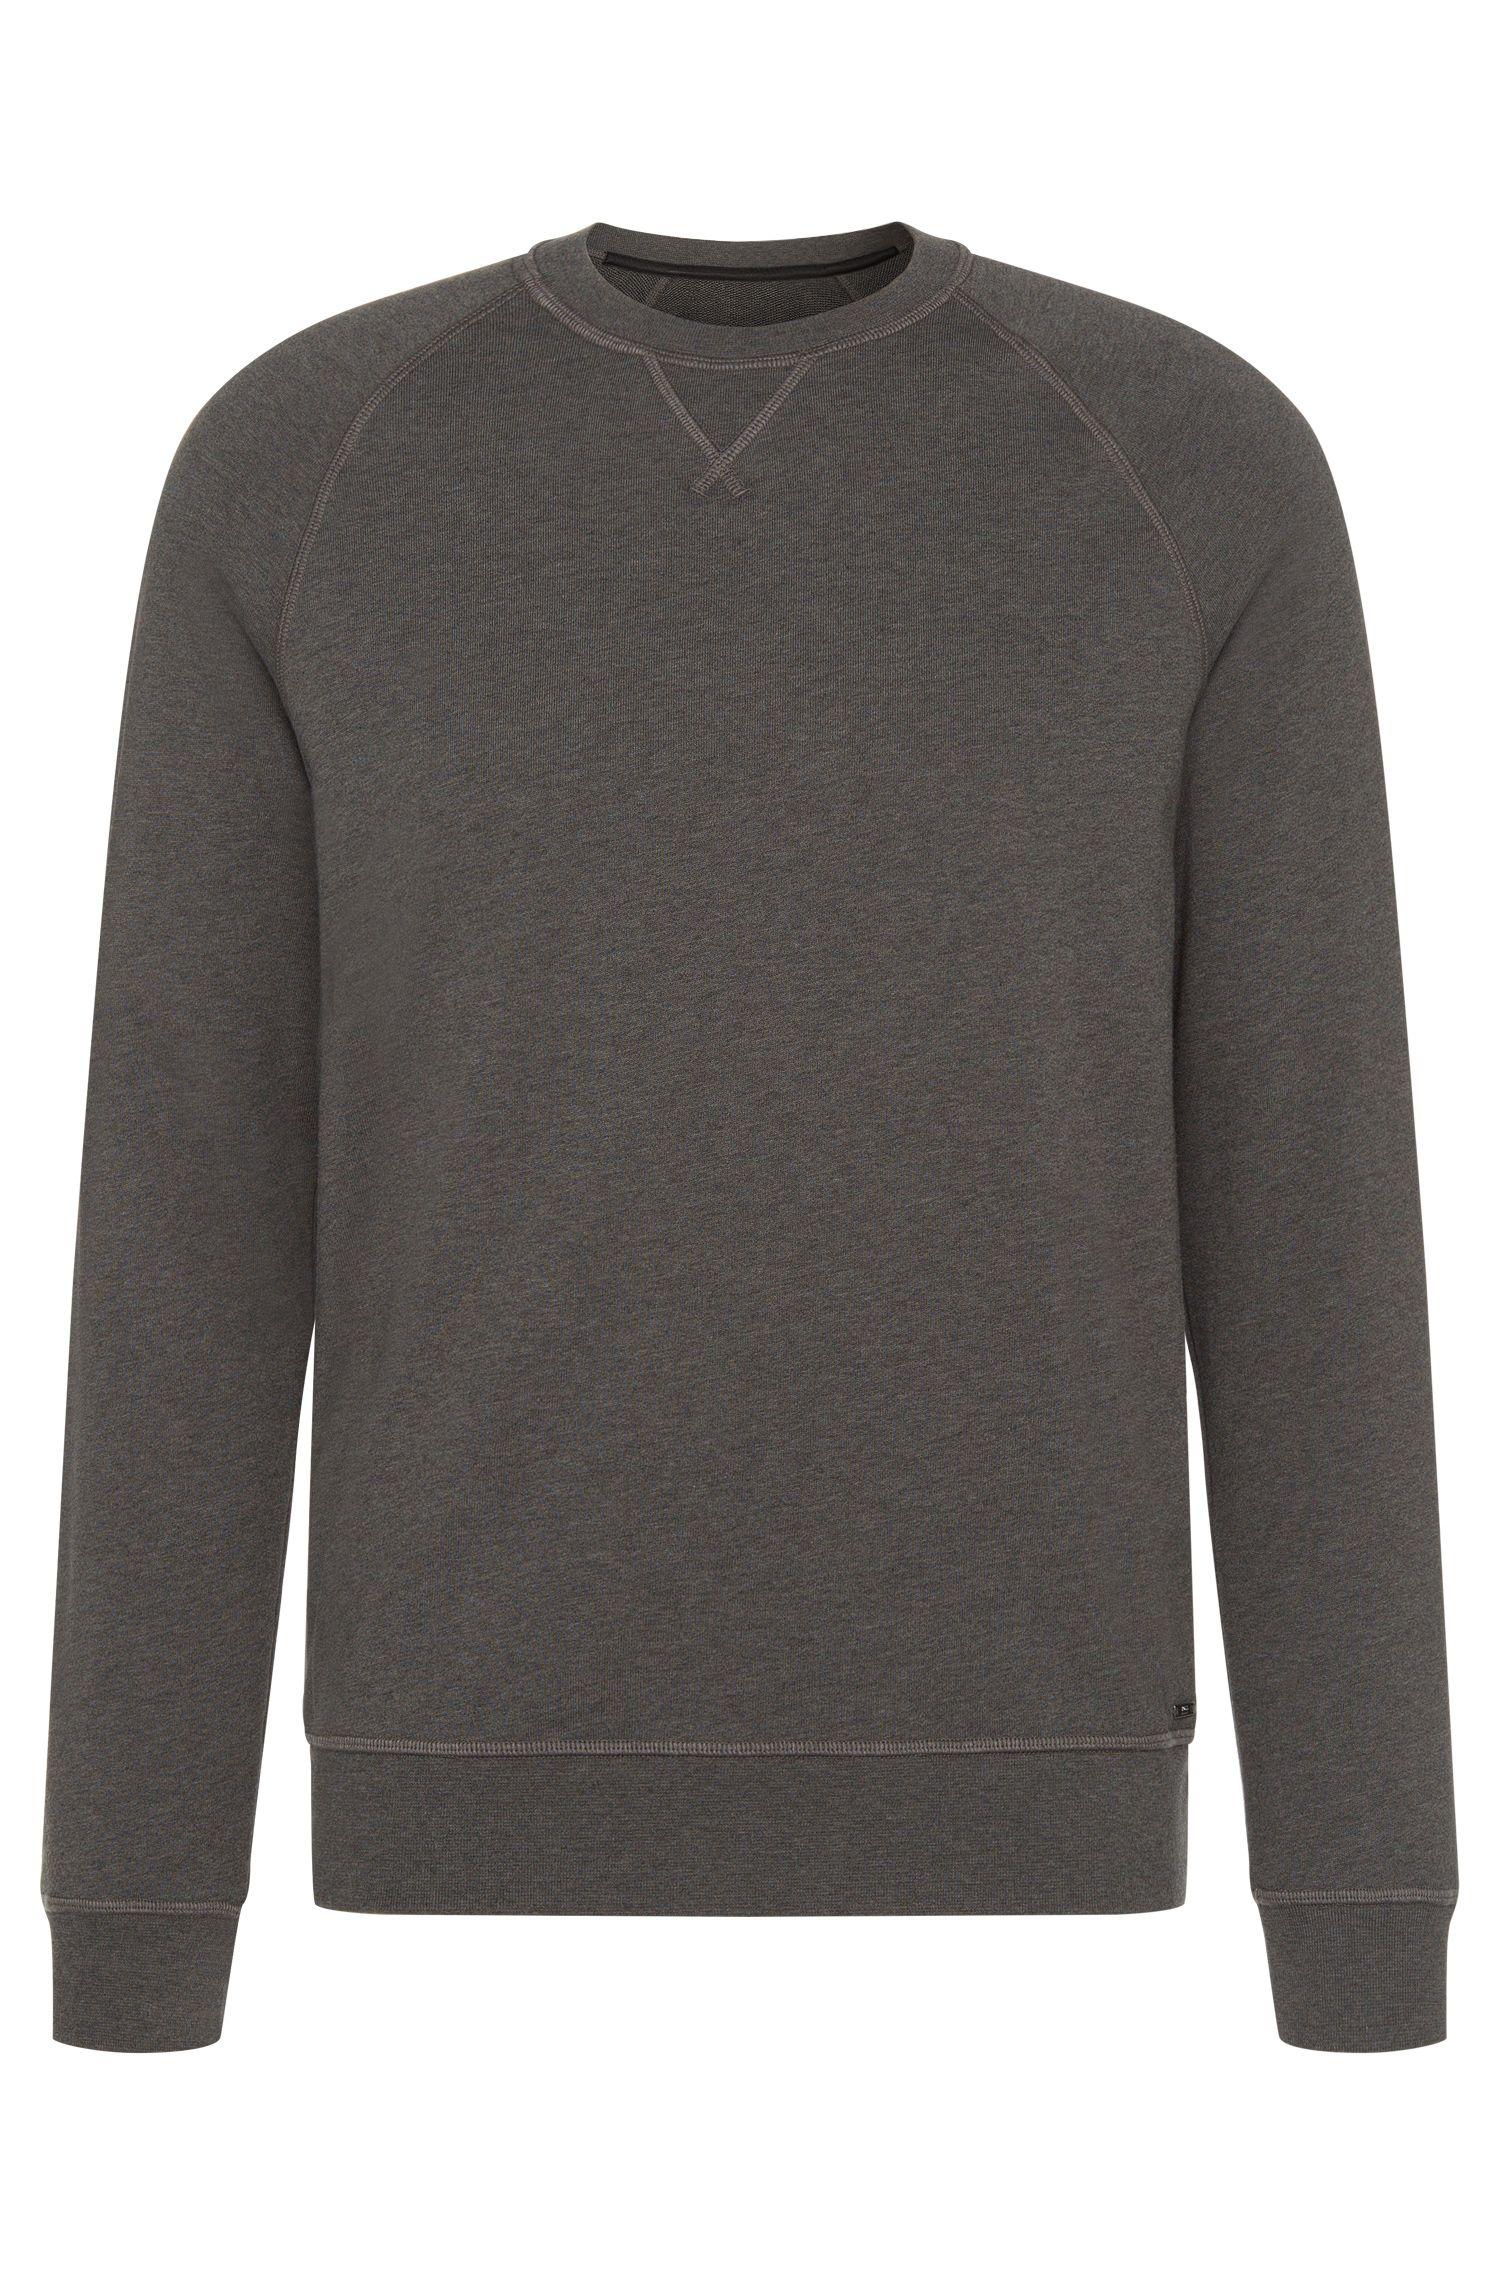 Gemêleerd slim-fit sweatshirt van katoen met raglanmouwen: 'Skubic 18-WS'